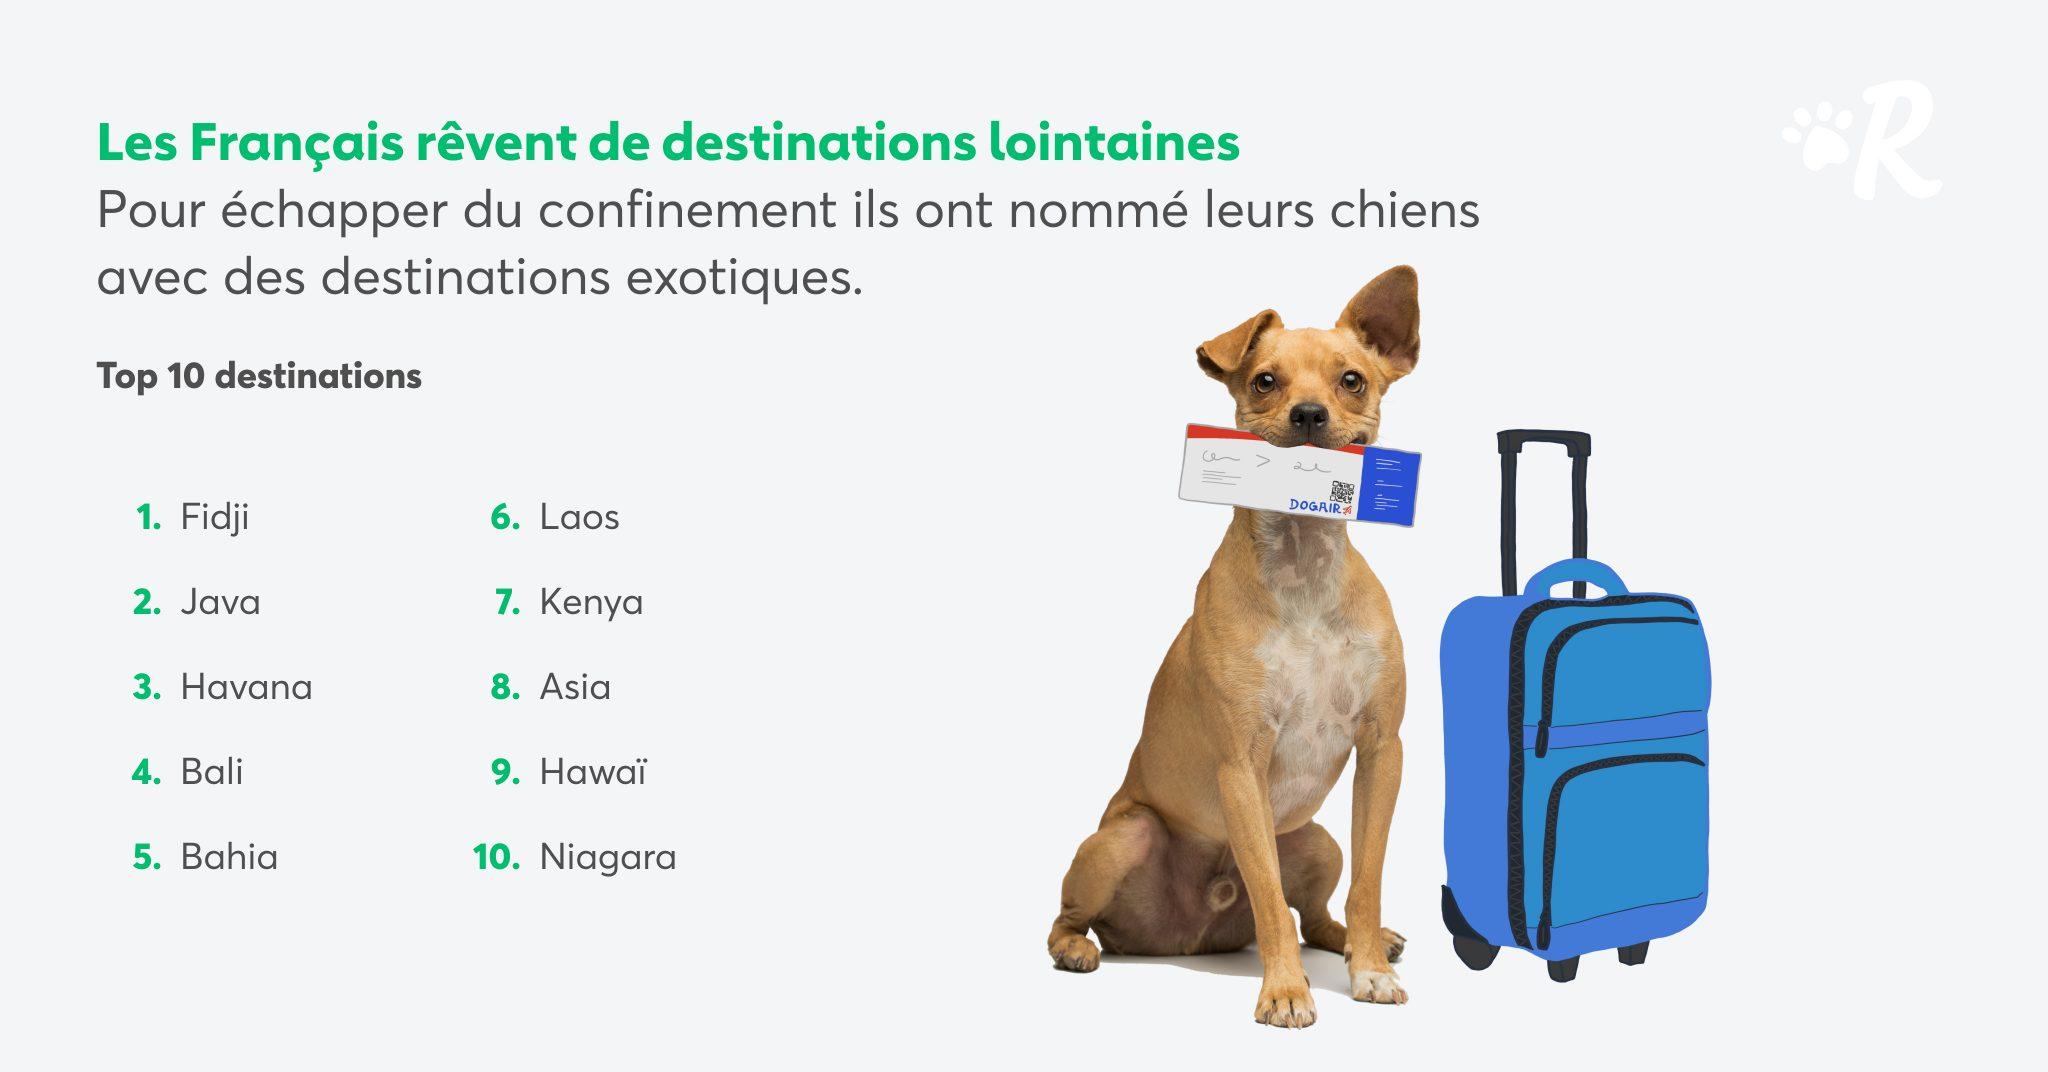 noms de chiens de destinations